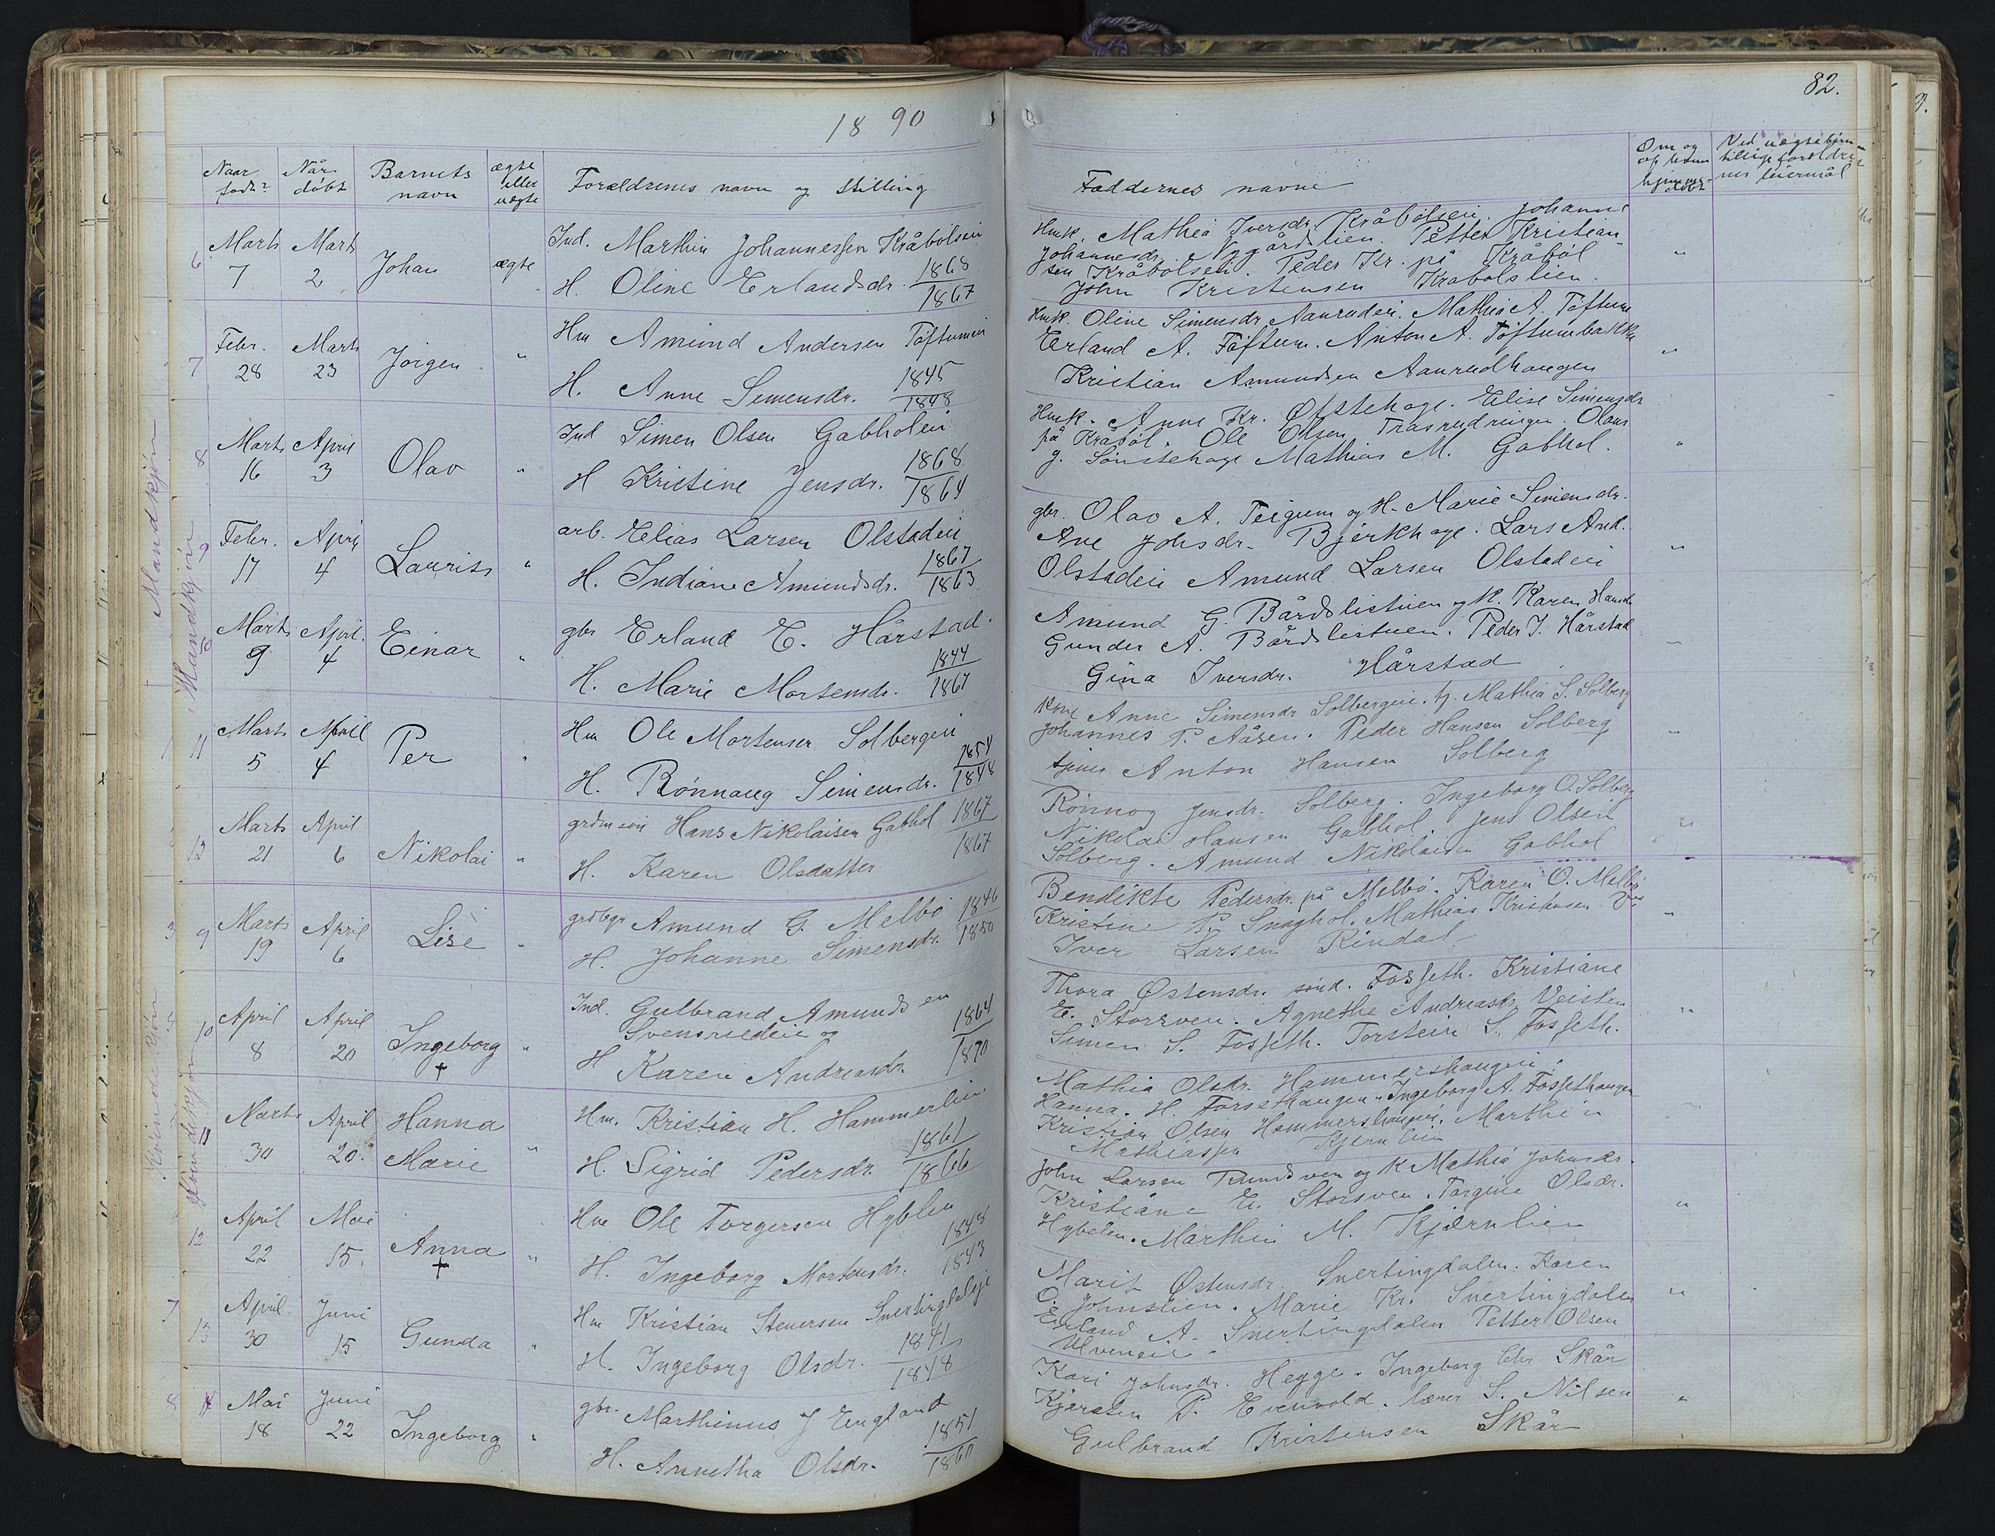 SAH, Vestre Gausdal prestekontor, Klokkerbok nr. 1, 1867-1895, s. 82